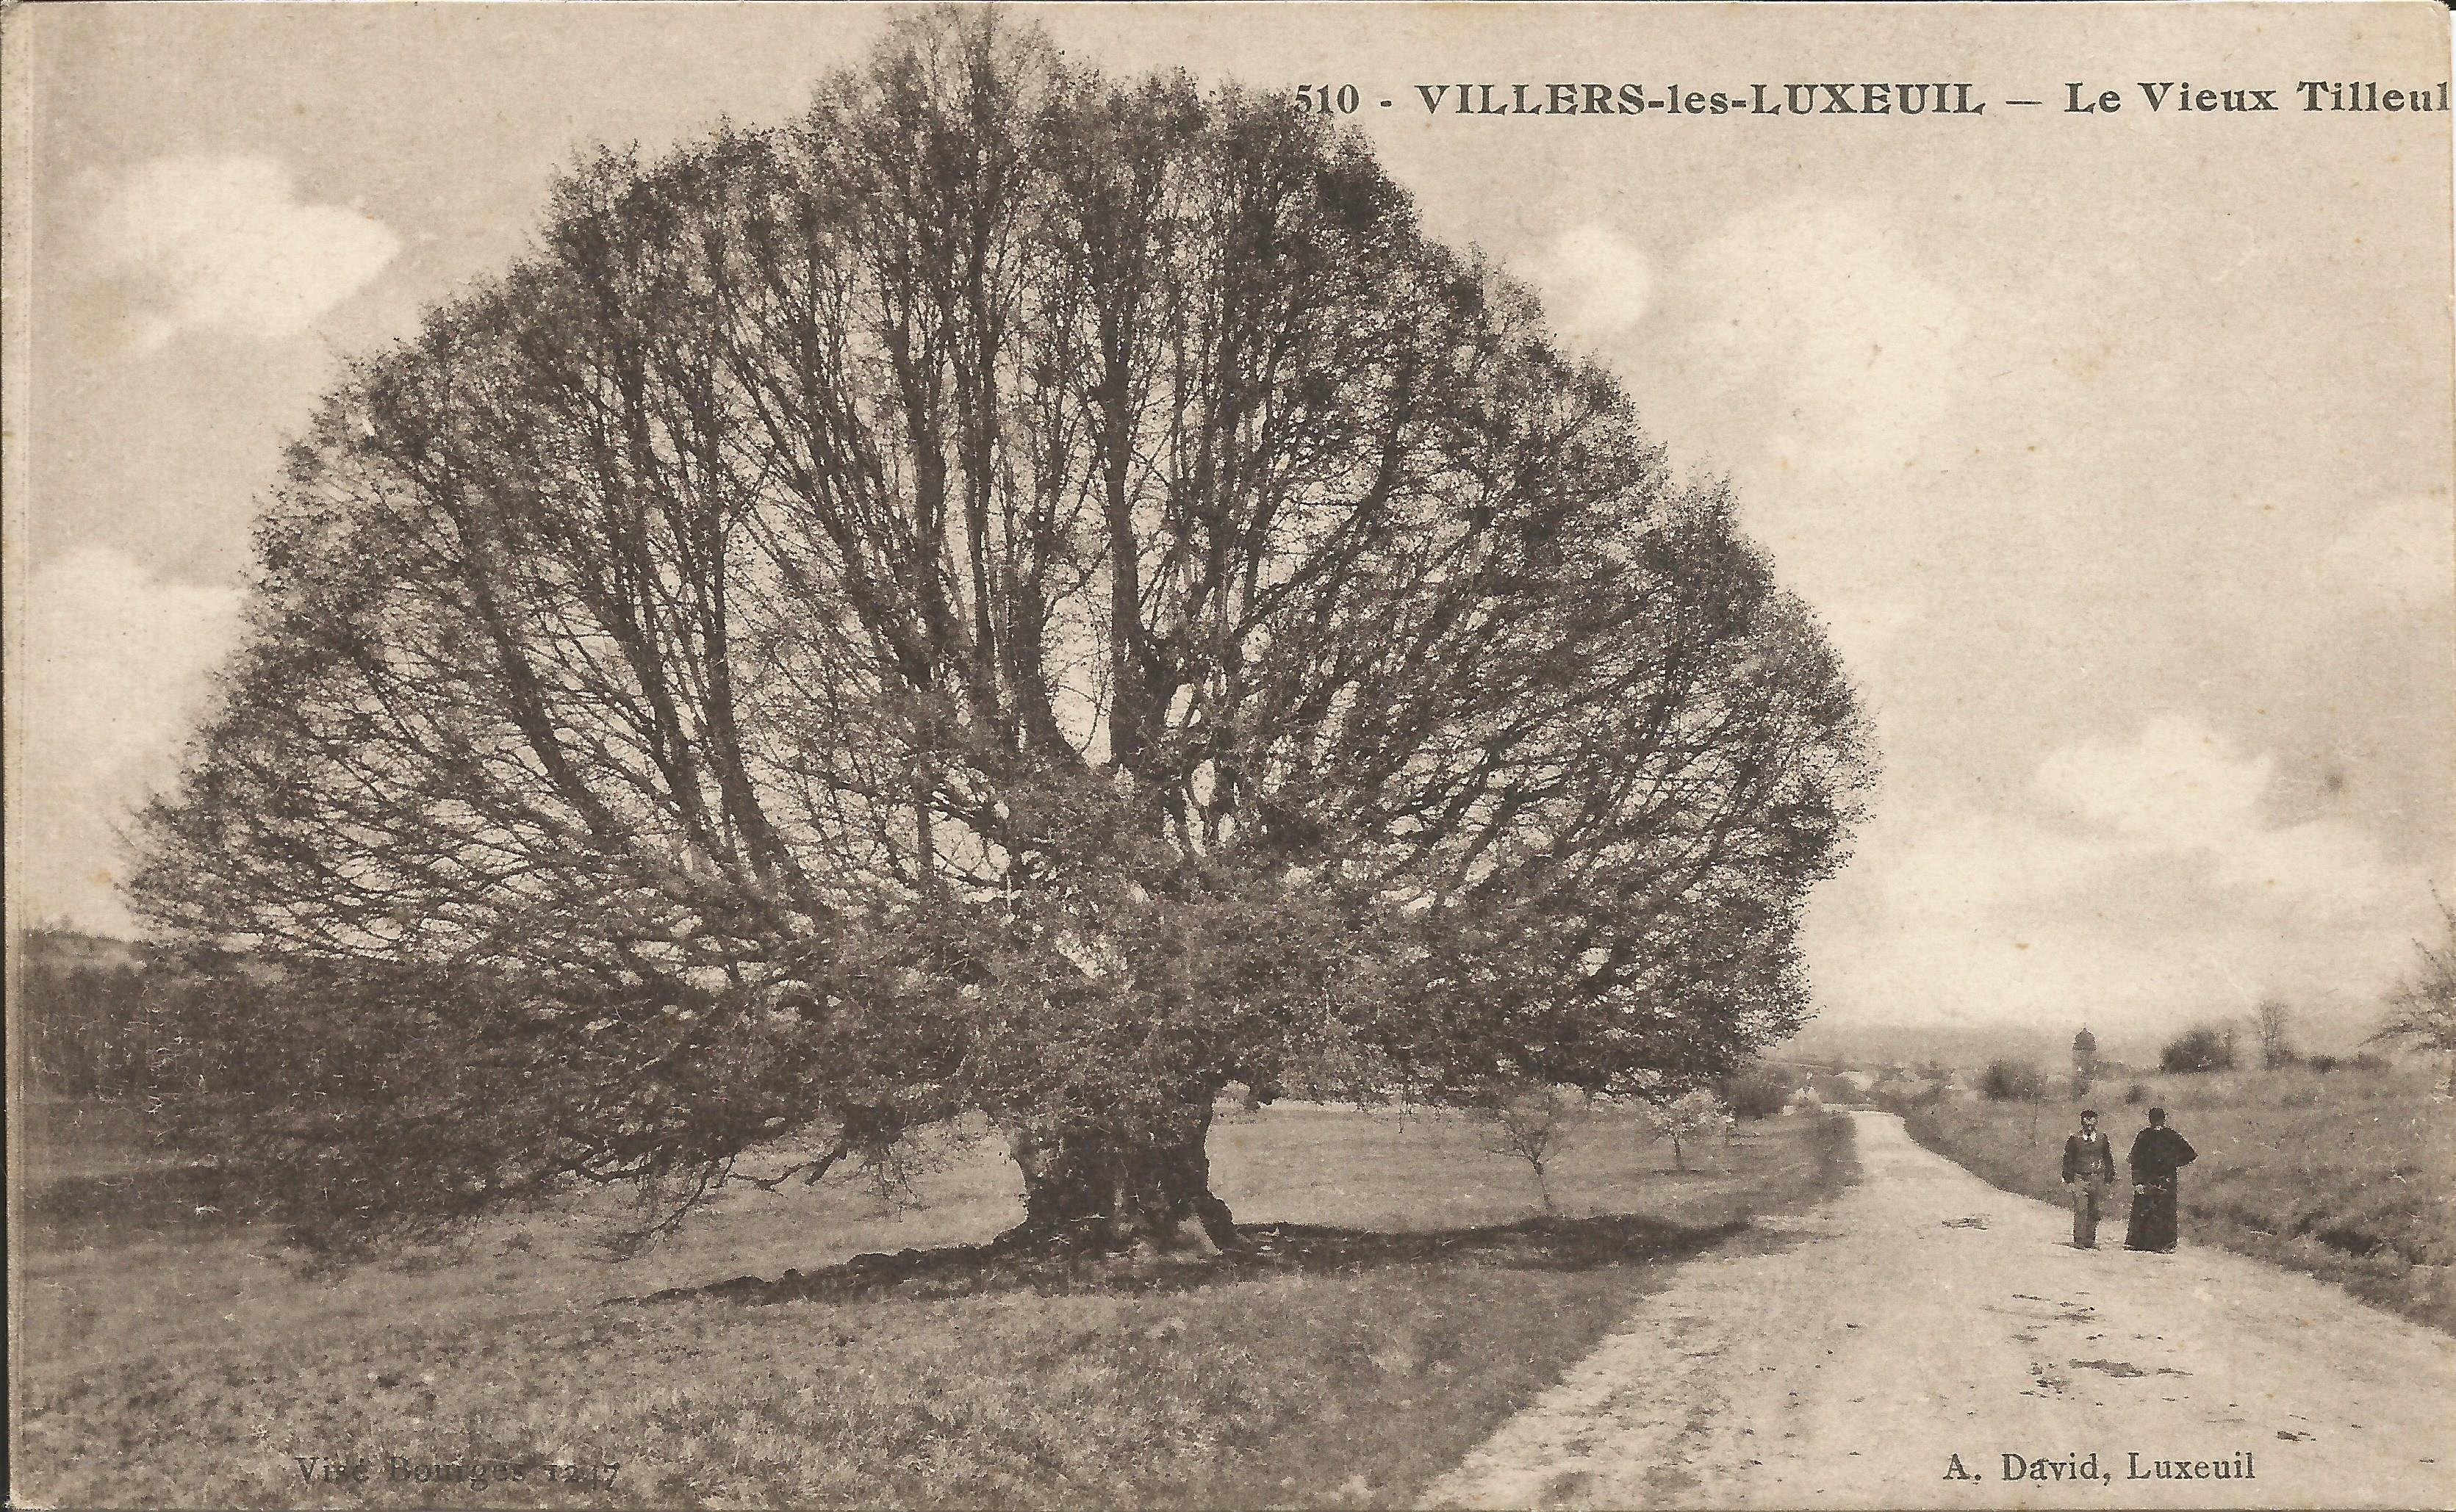 https://www.villers-les-luxeuil.com/projets/villers/files/images/Cartes_postales/Tilleul_2015/Le_Tilleul_8.jpg